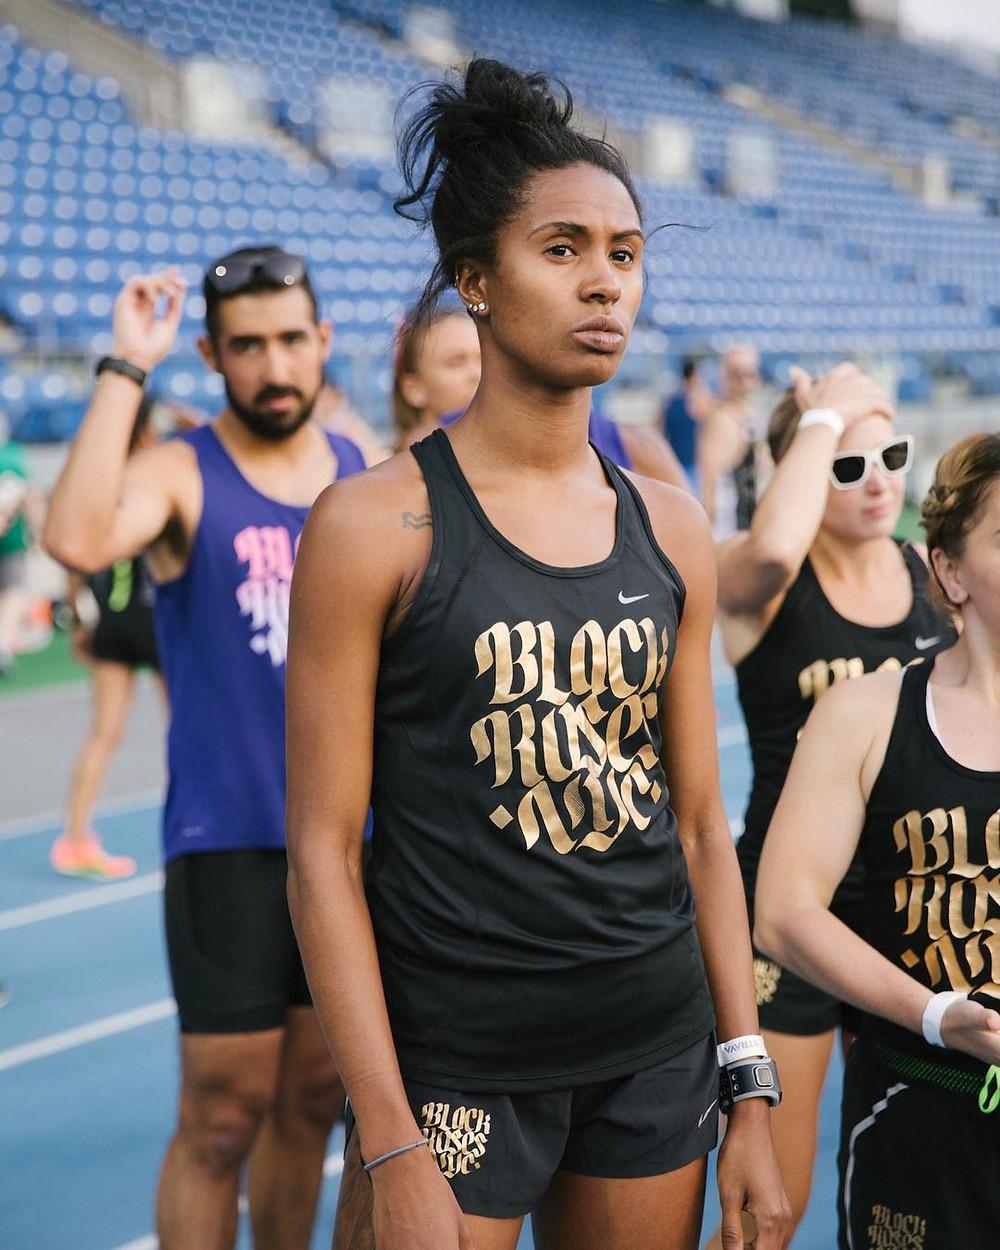 Danielle Macneilly marathon runner black roses running club nyc